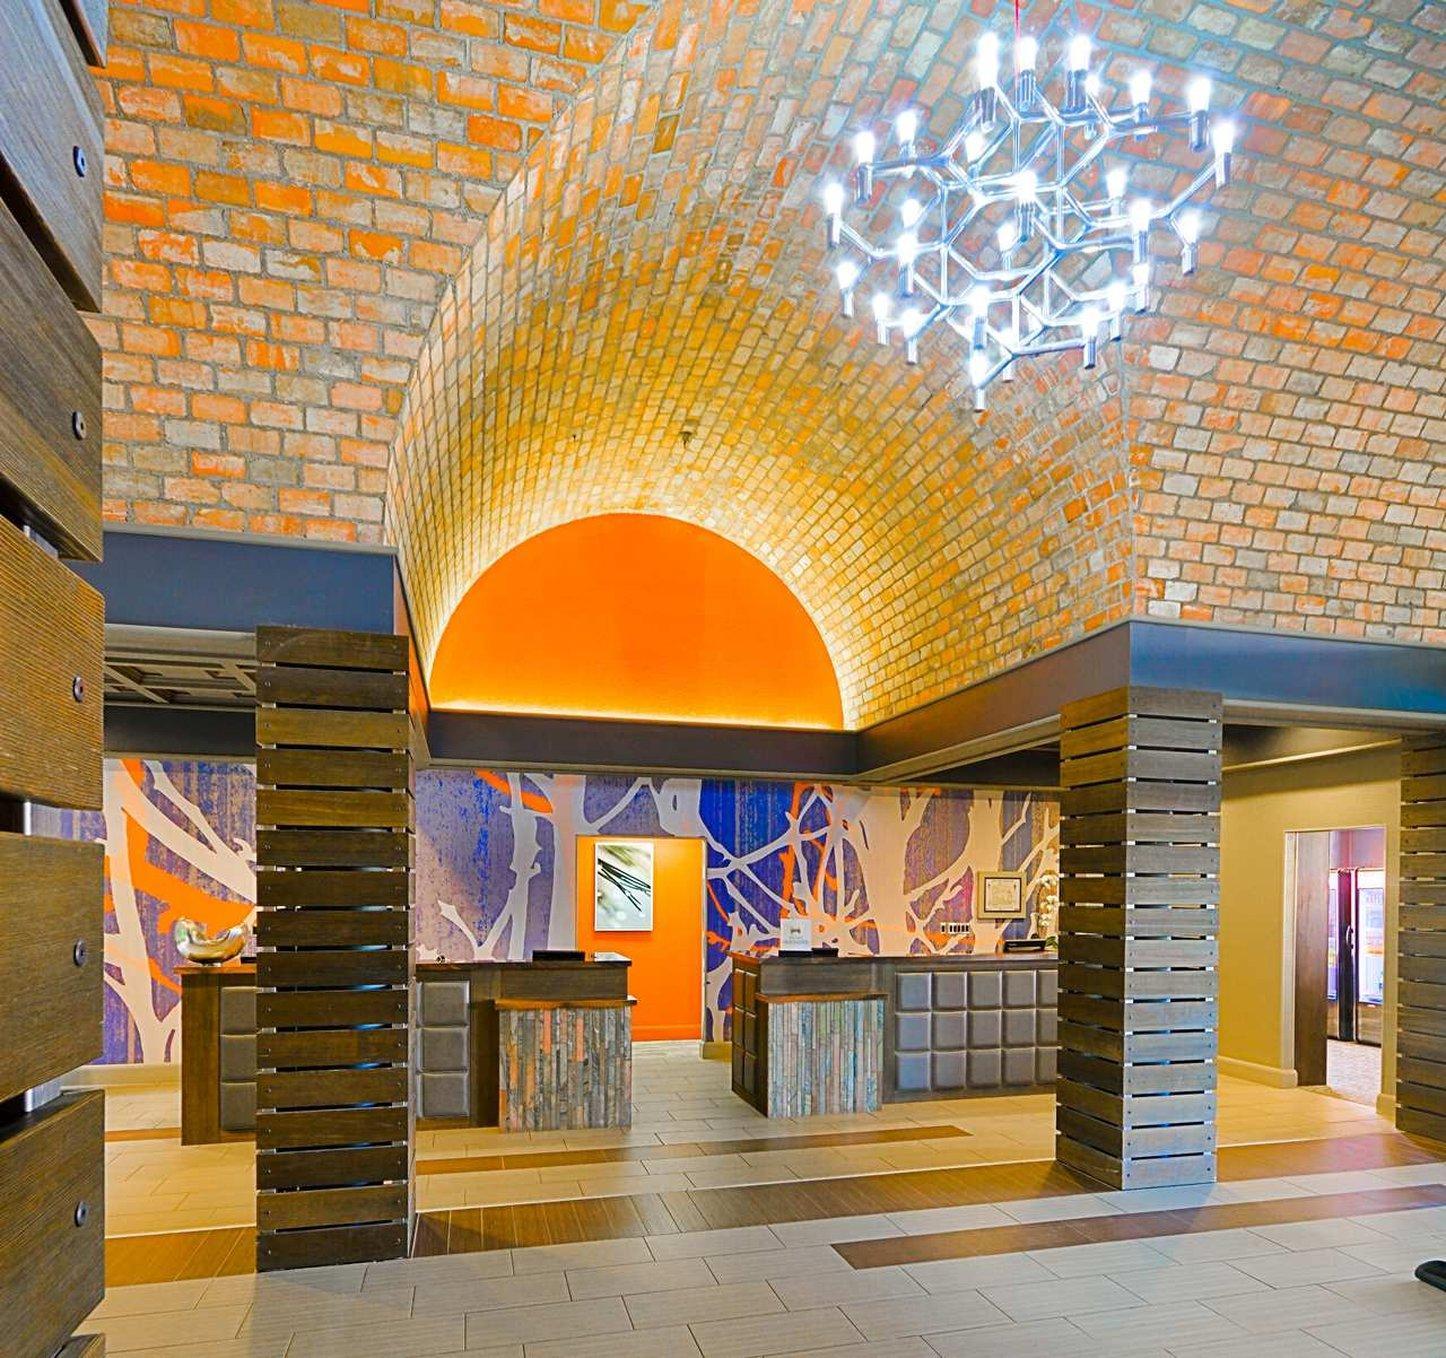 Embassy Suites by Hilton Denver Stapleton